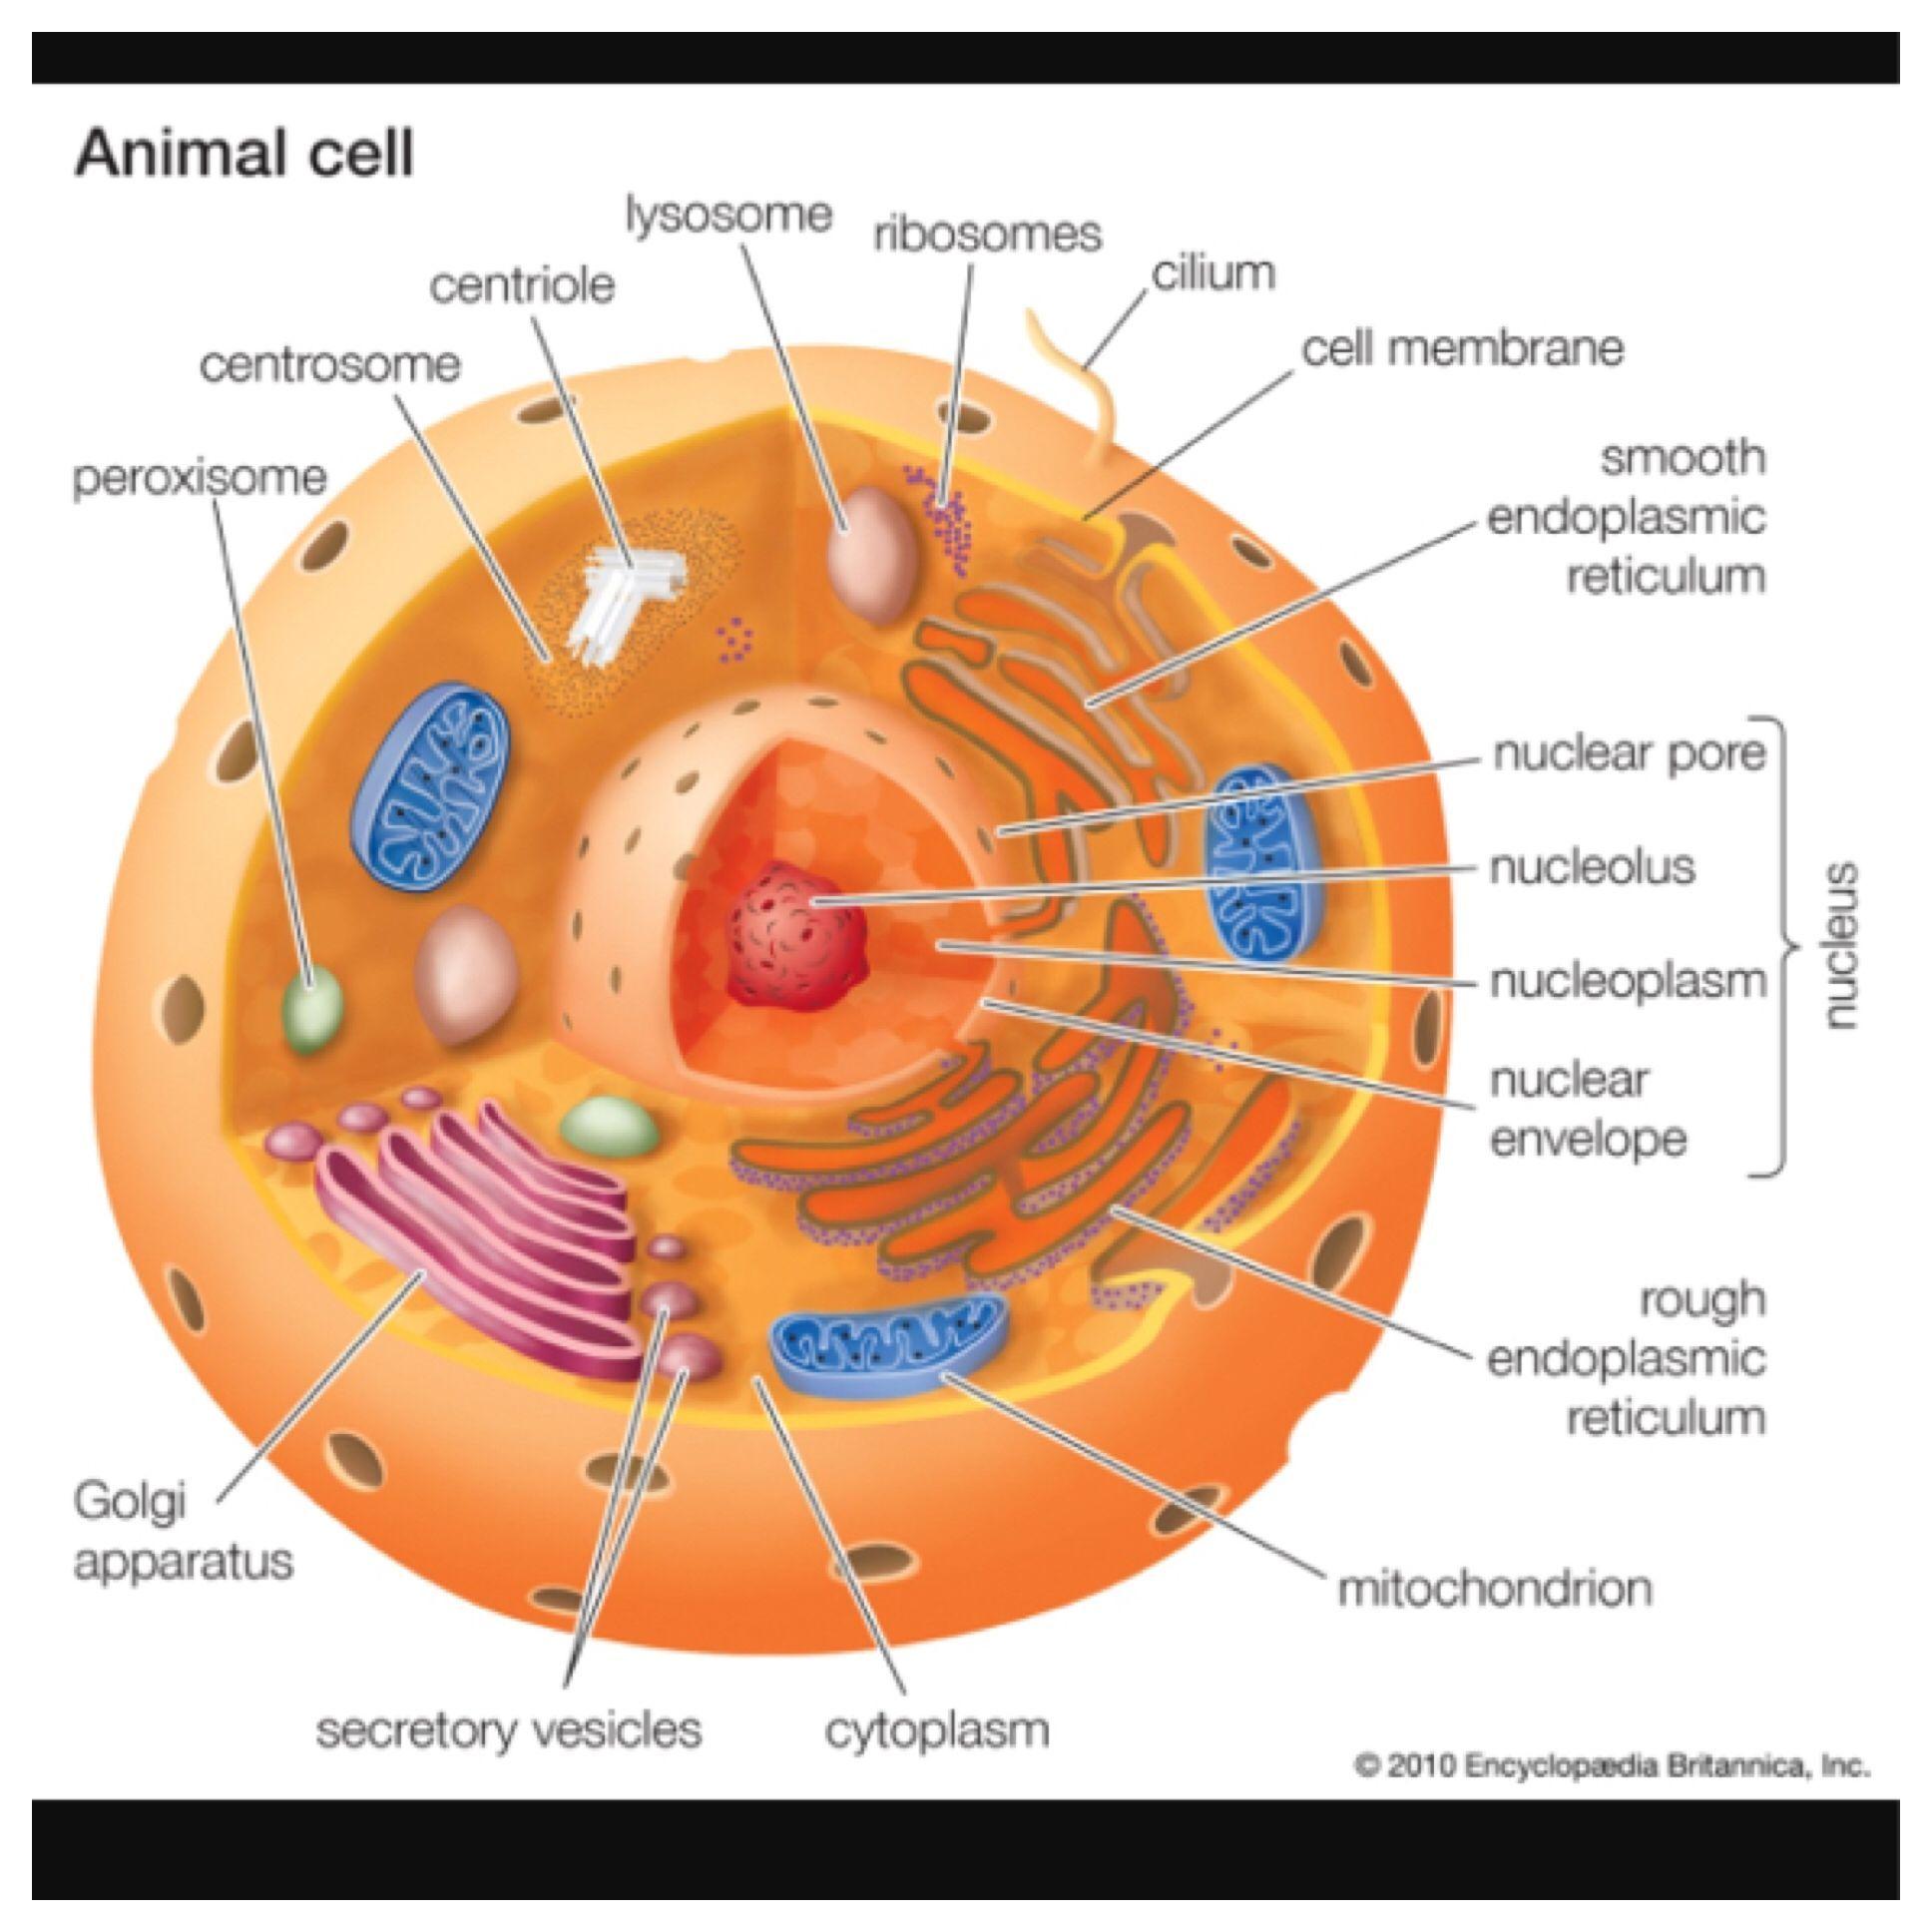 hight resolution of animal cell model ideas for your science project animal cell model cell model also animal cell diagram on easy animal cell diagram